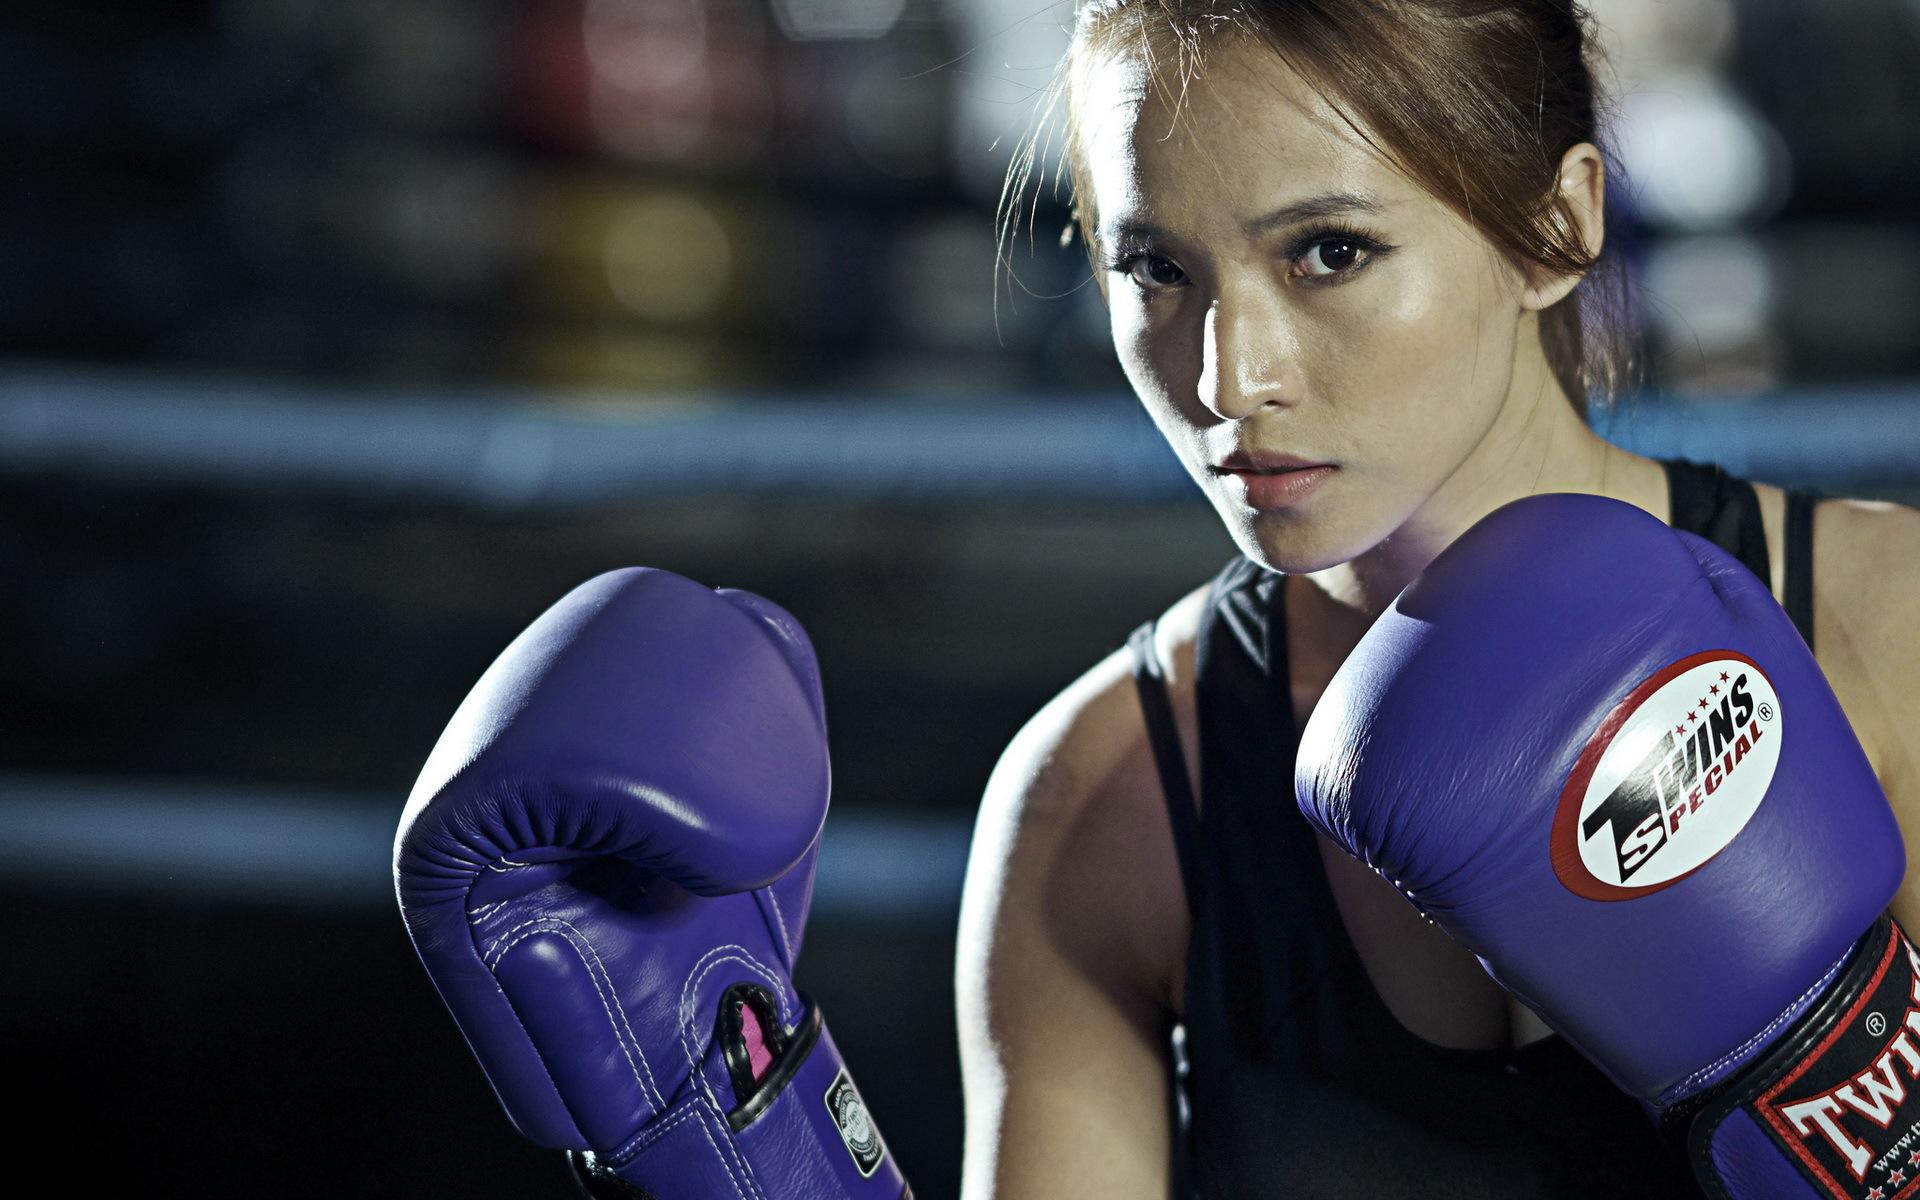 бокс, девушка, тренировка